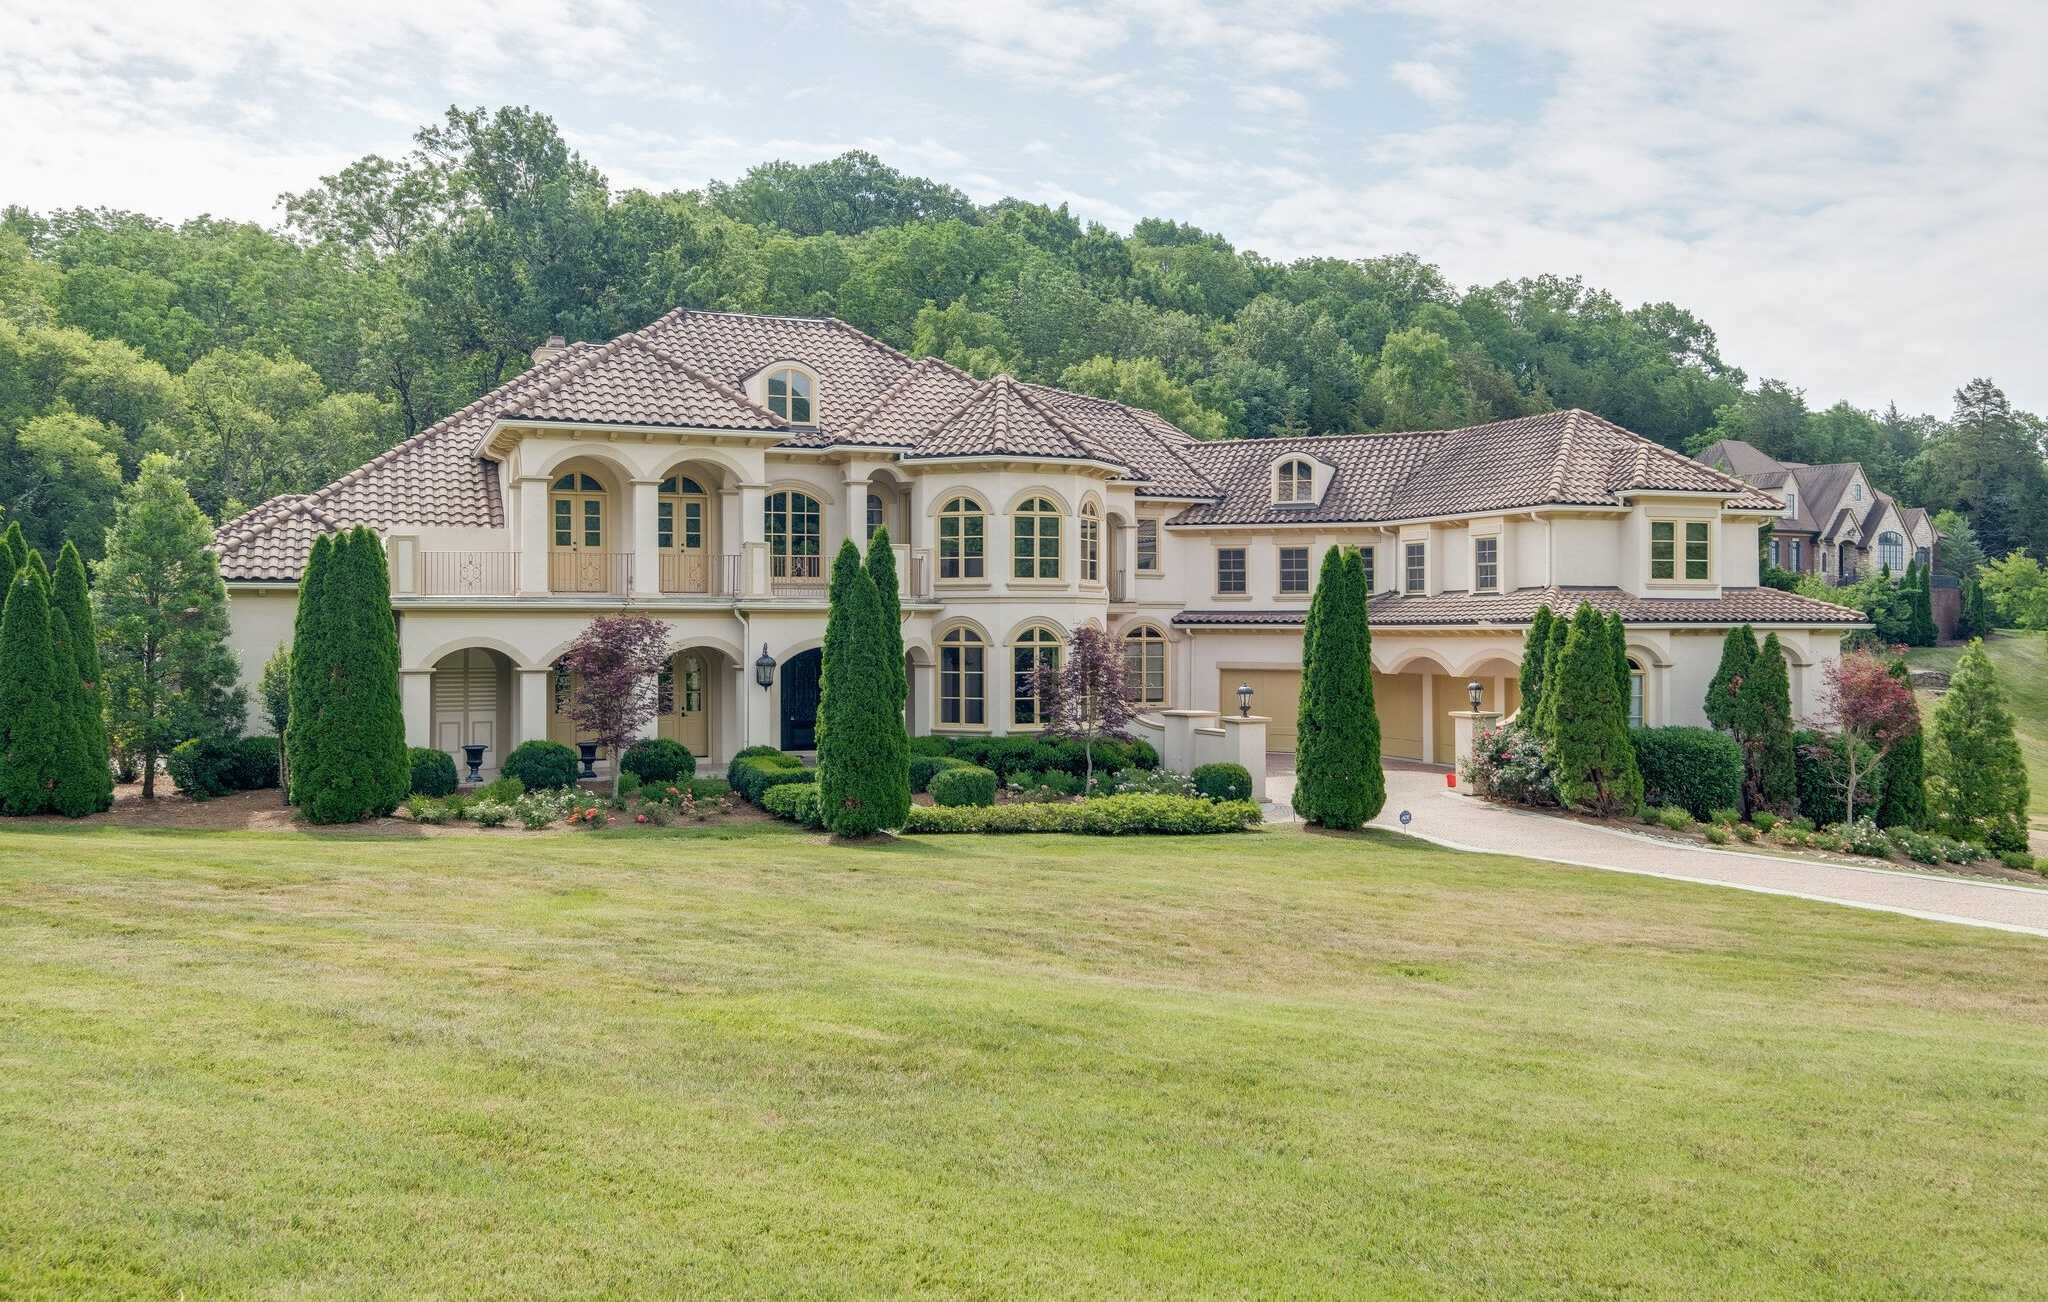 $2,995,000 - 5Br/6Ba -  for Sale in Cambridge Downs, Nashville